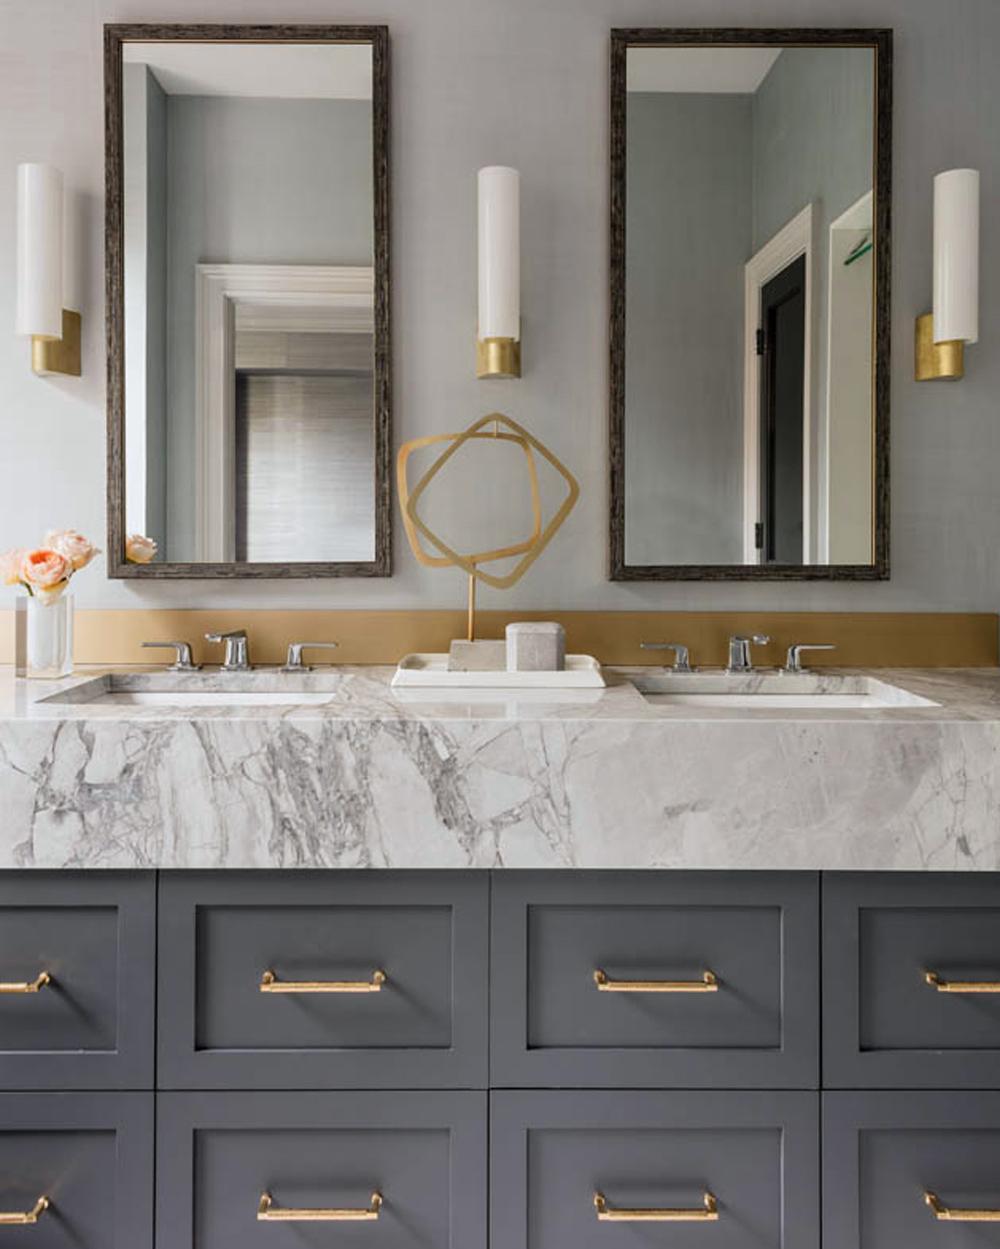 Bathroom renovation tips from First Sense || Lighting a bathroom